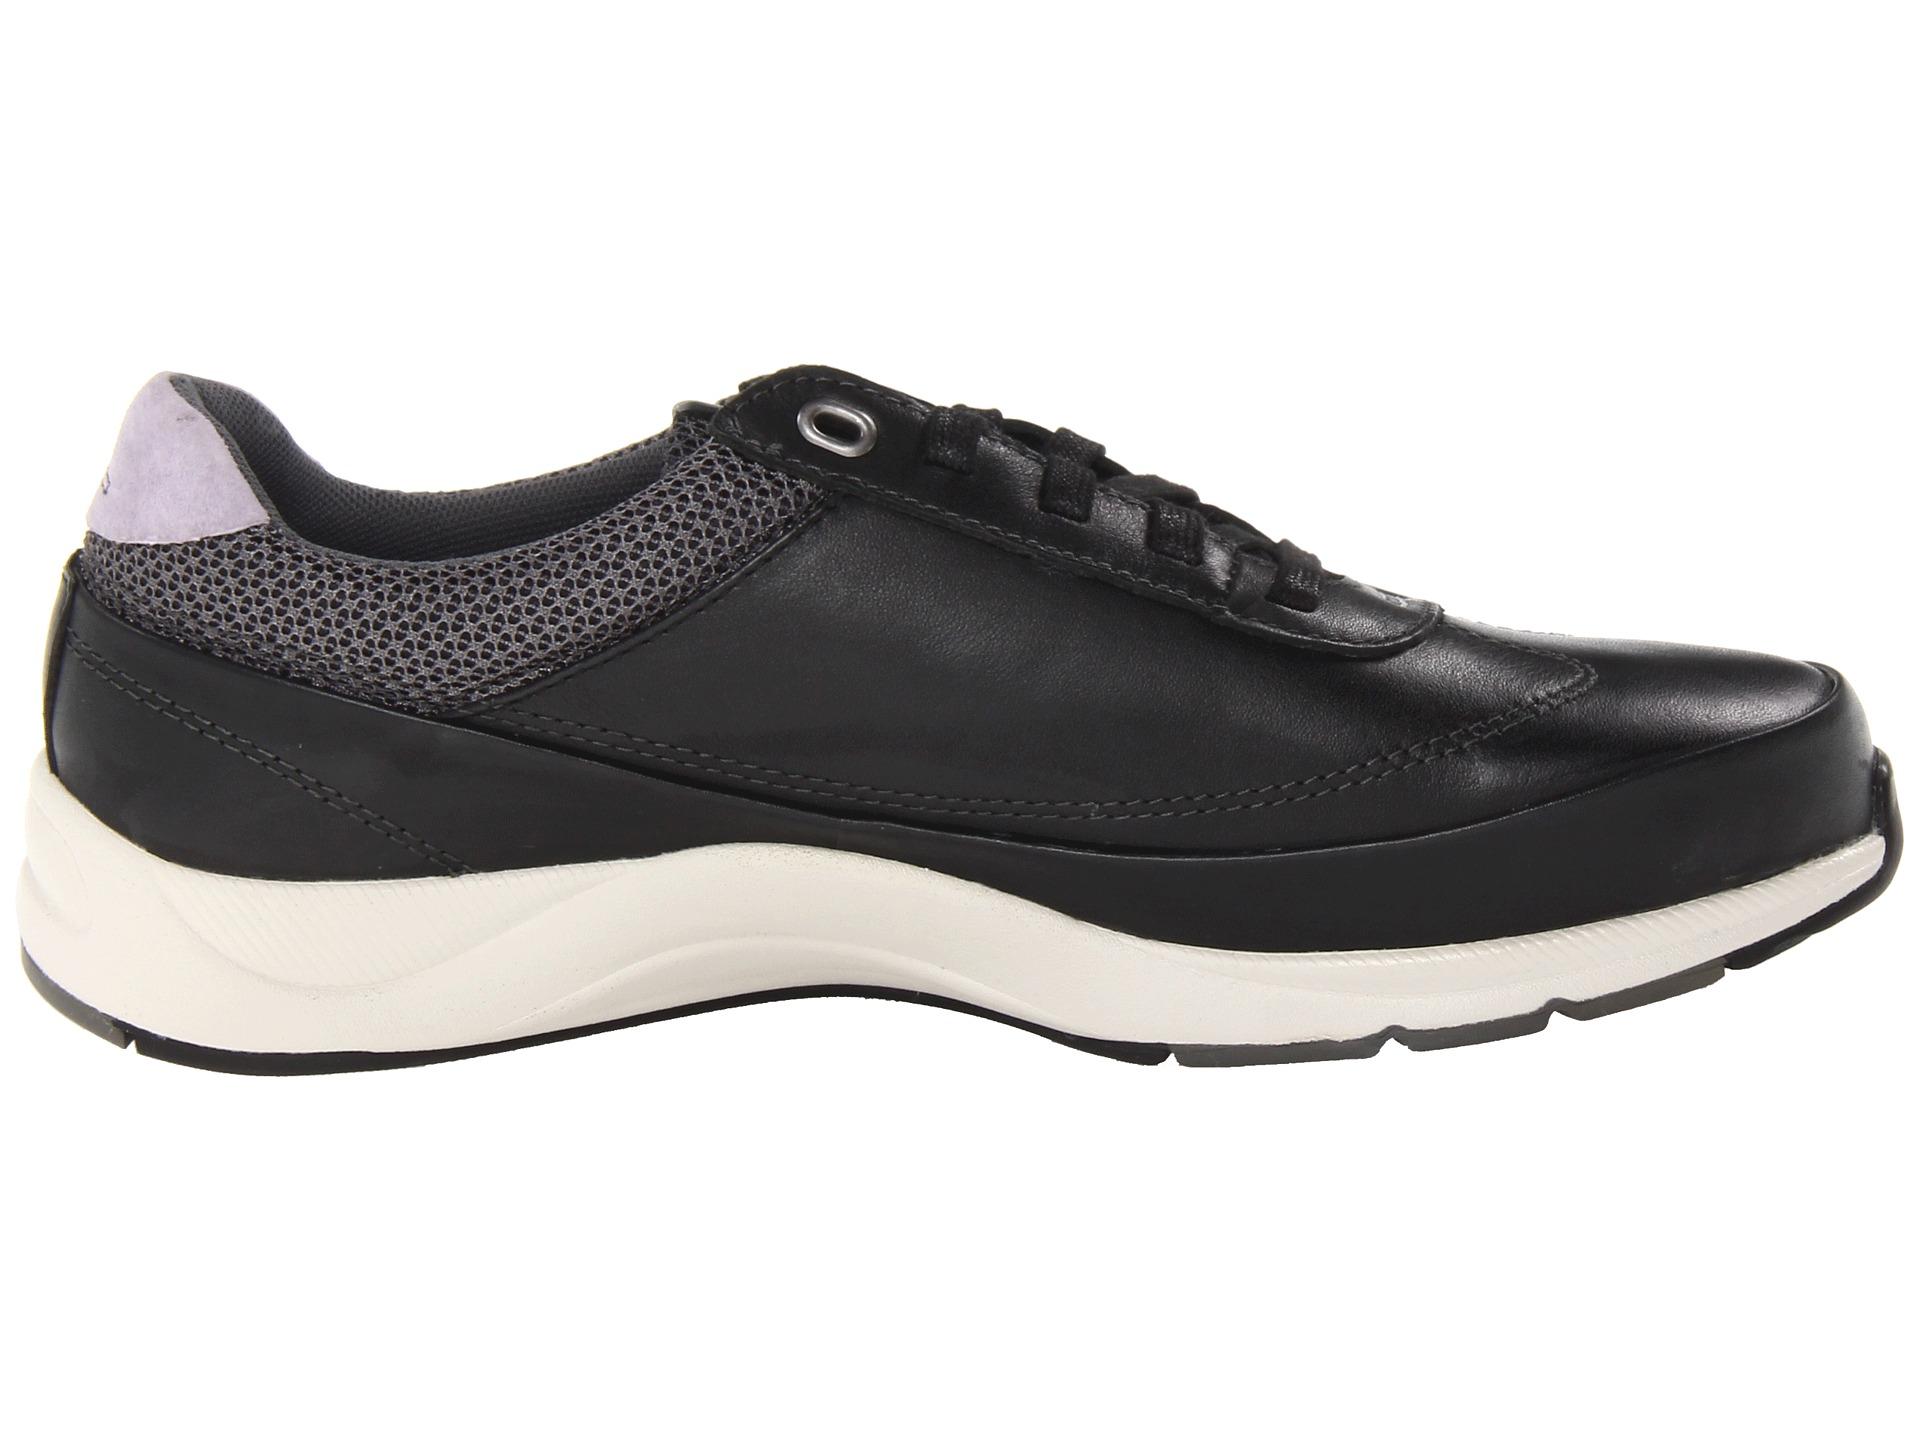 Car Service Columbus >> new balance 980 women's walking shoe | Running Motors USA